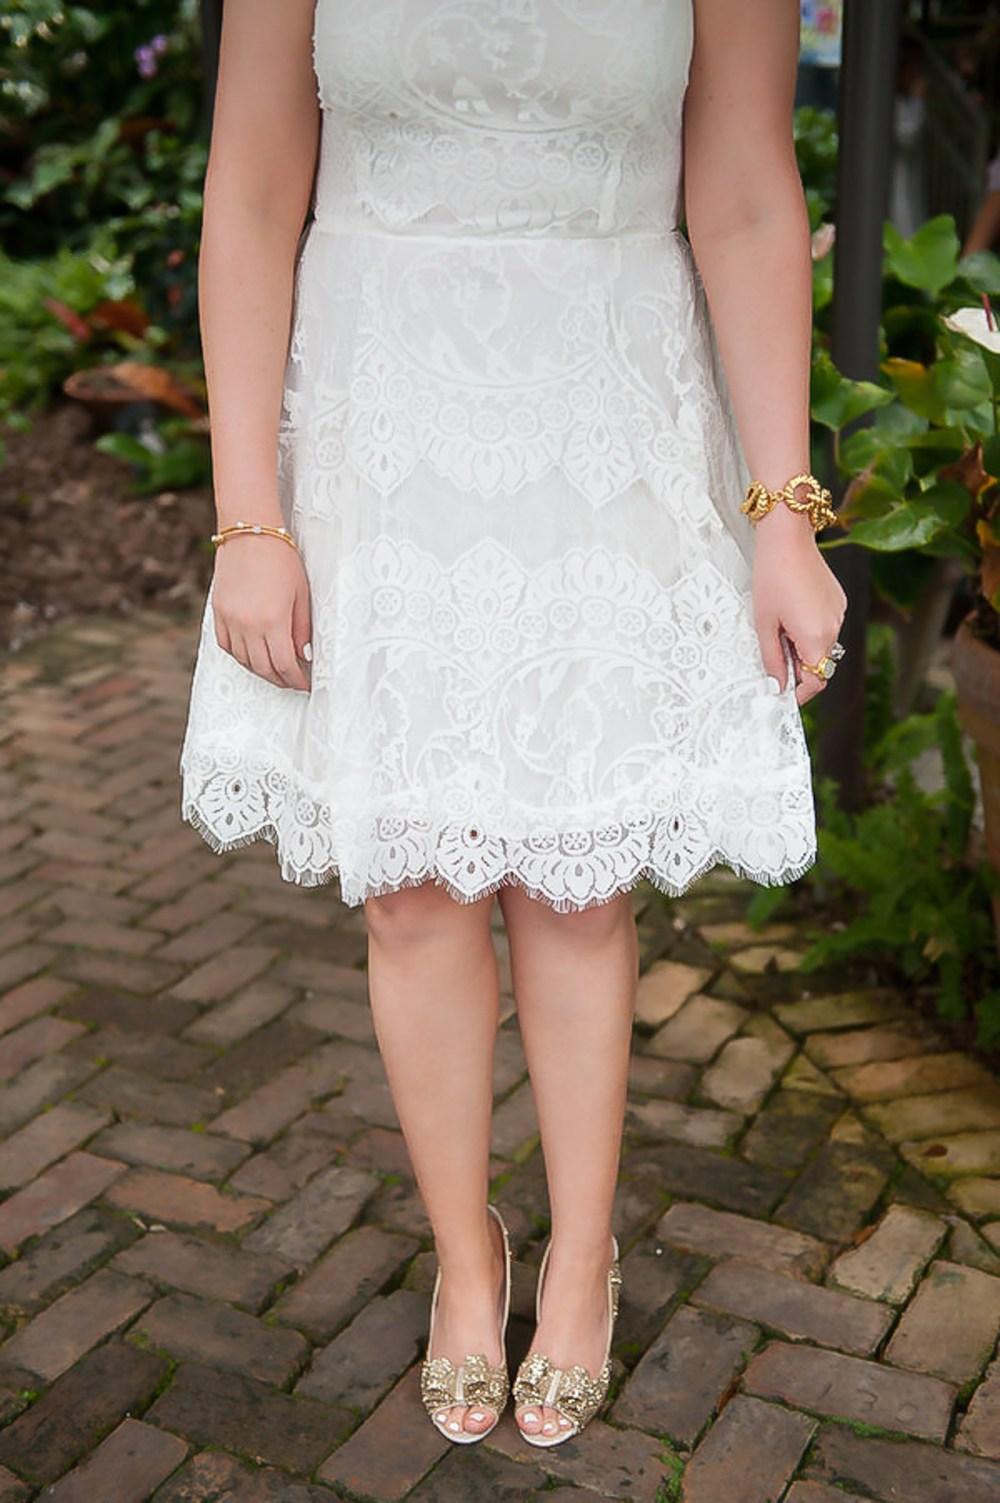 Little White Dress Bride Kate Spade Bridal Shower Gold Glitter Pumps Fancy Things